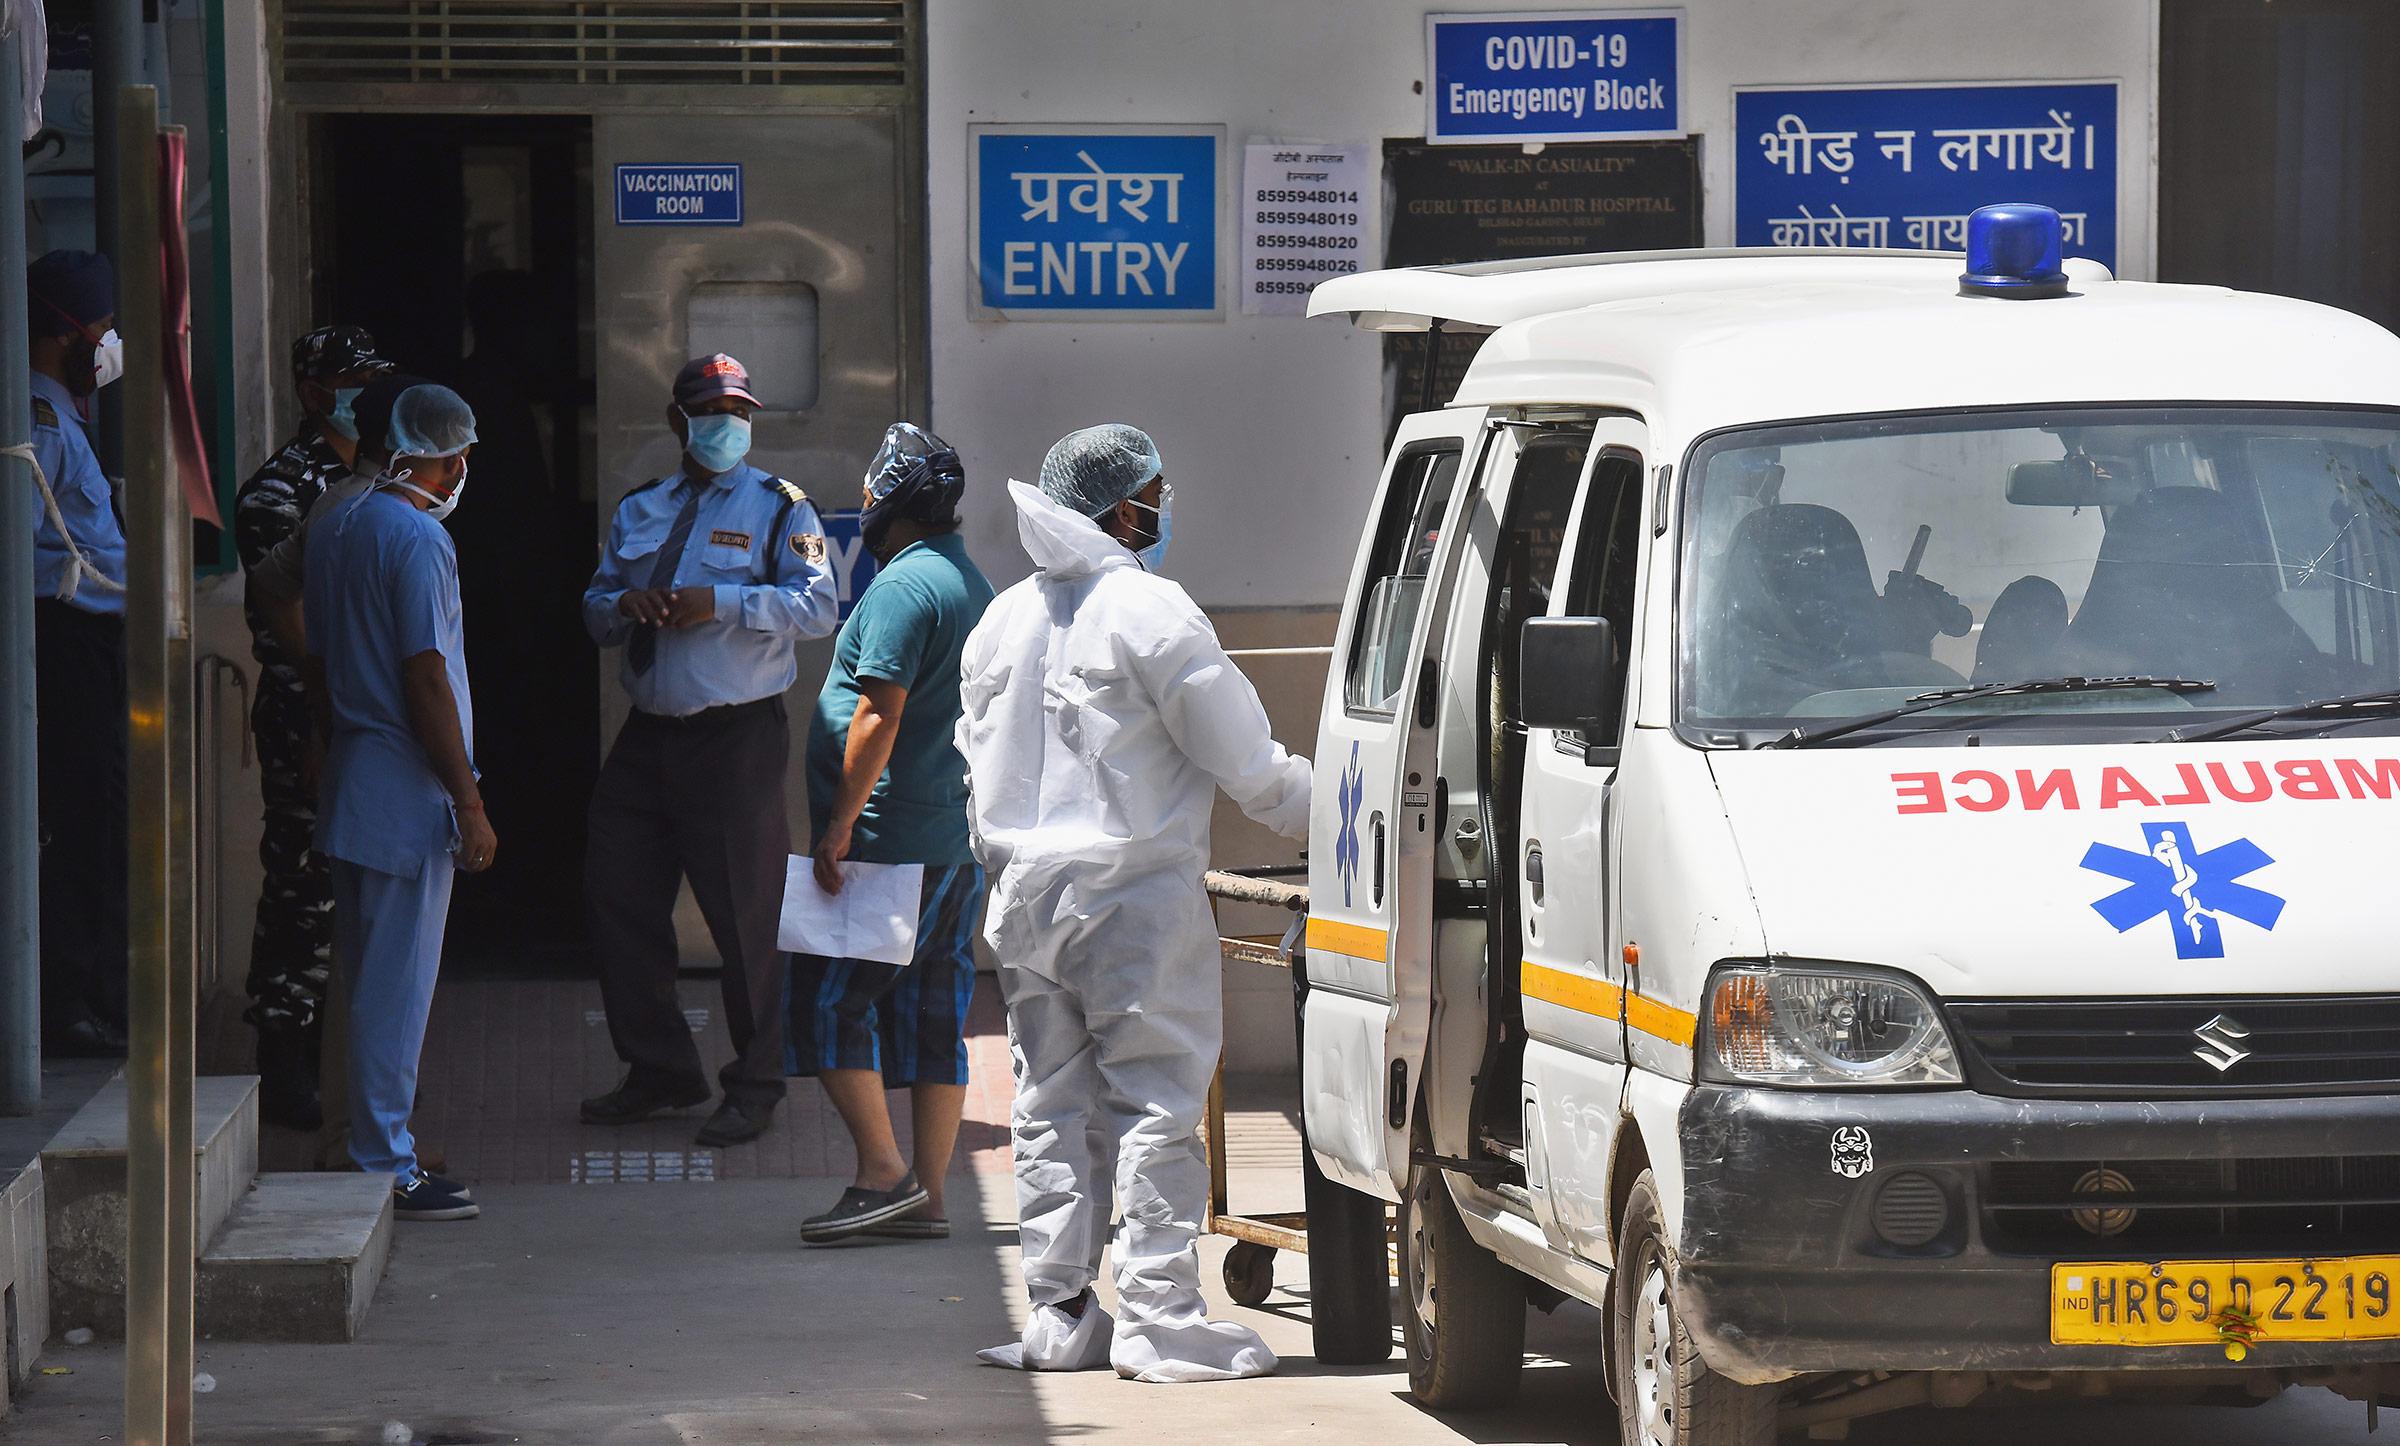 Health workers tend to a Covid-19 patient at Guru Teg Bahadur Hospital on April 25, in New Delhi, India.